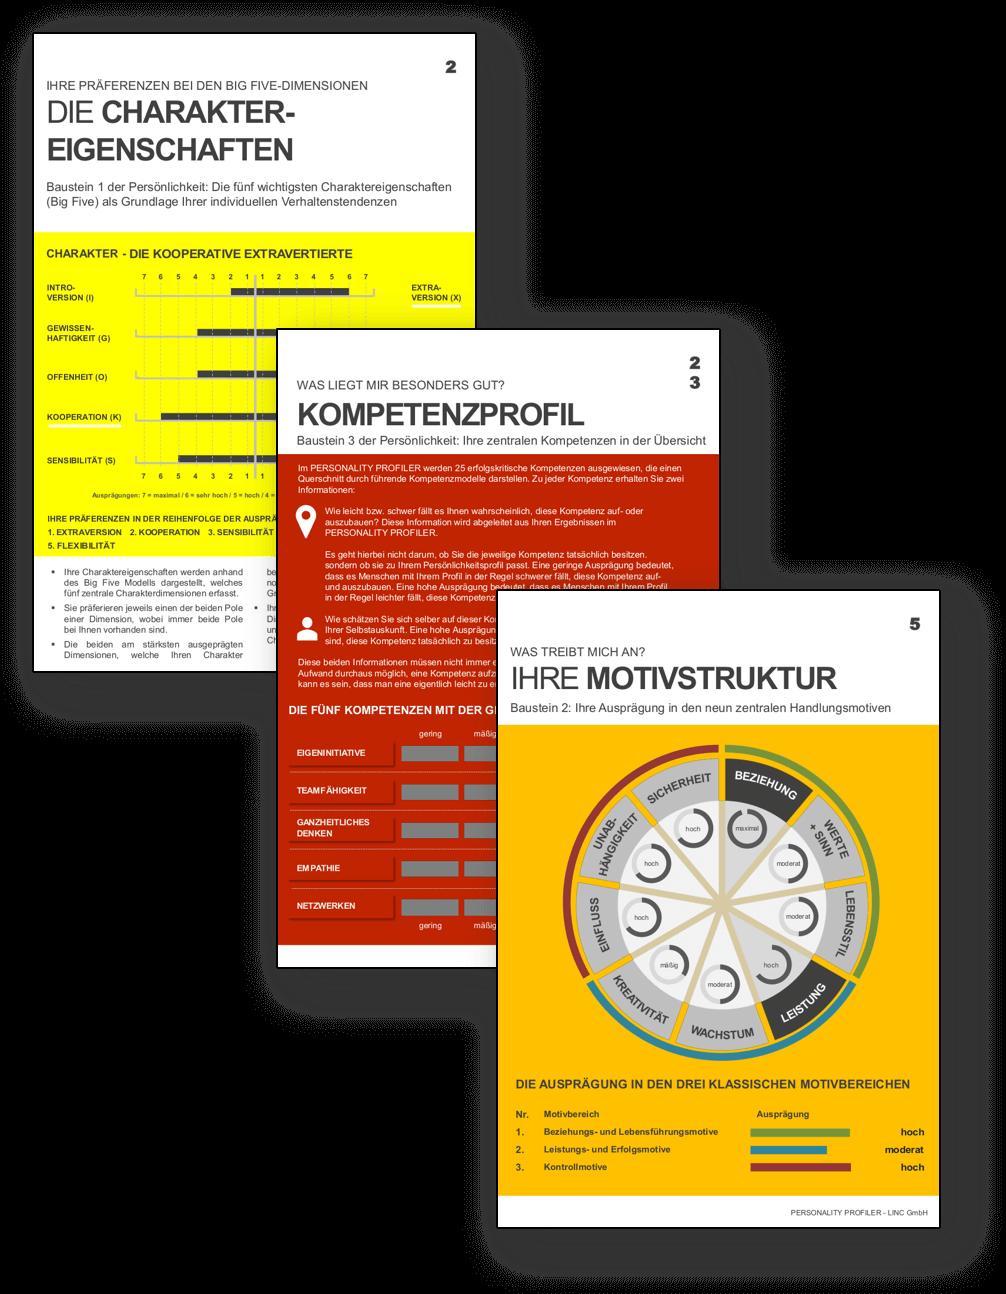 LINC Personality Profiler Kompetenz